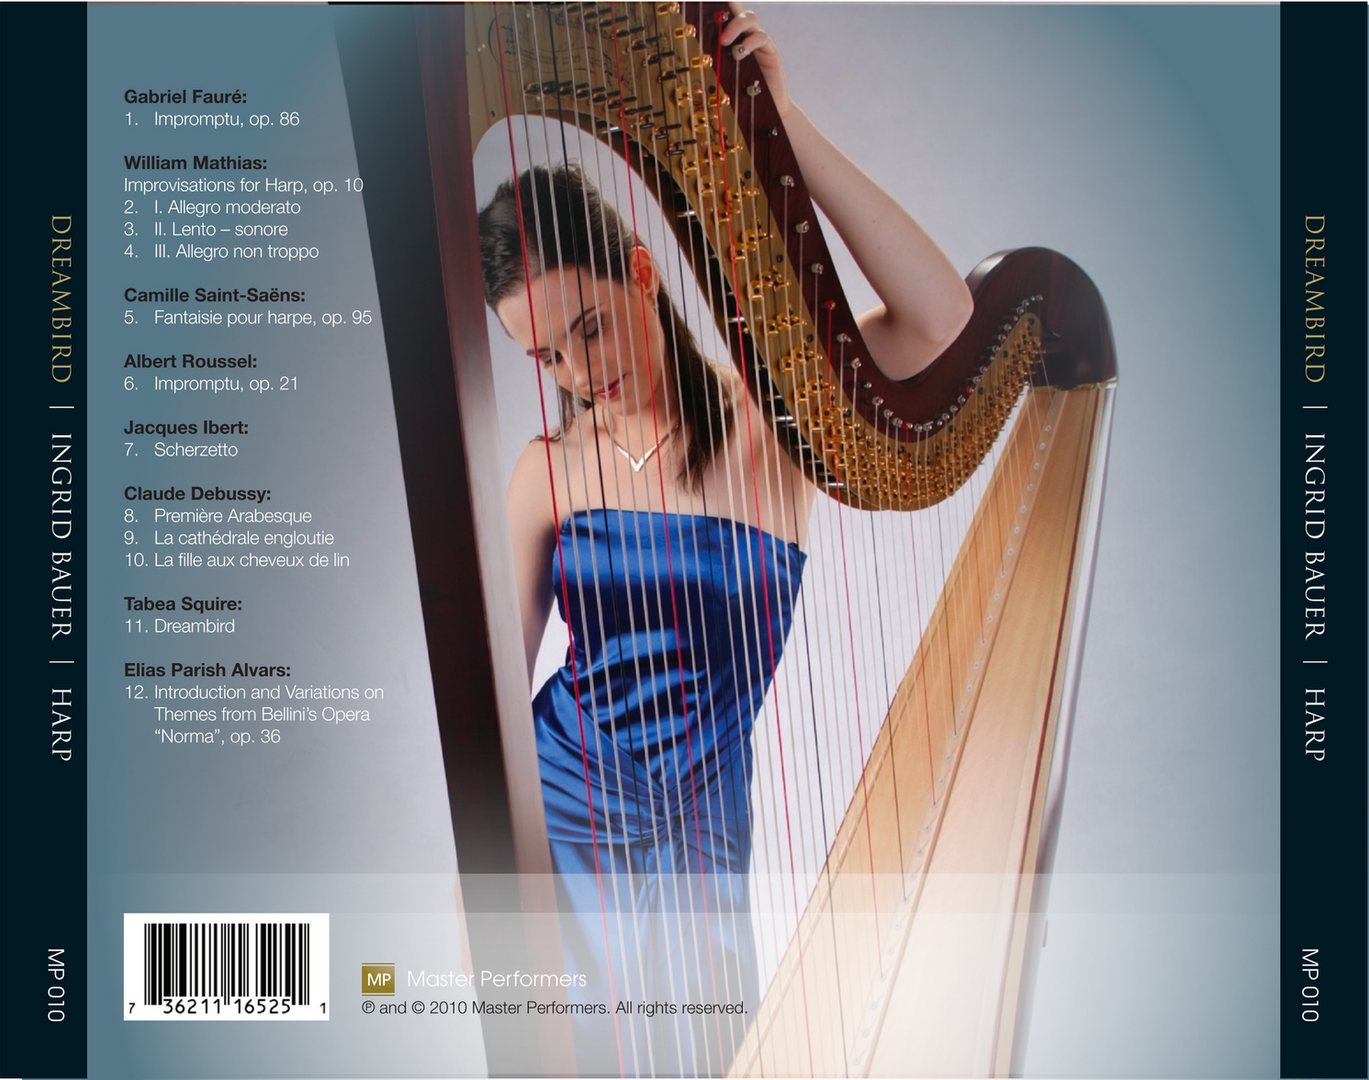 Ingrid Bauer Dreambird CD Tray